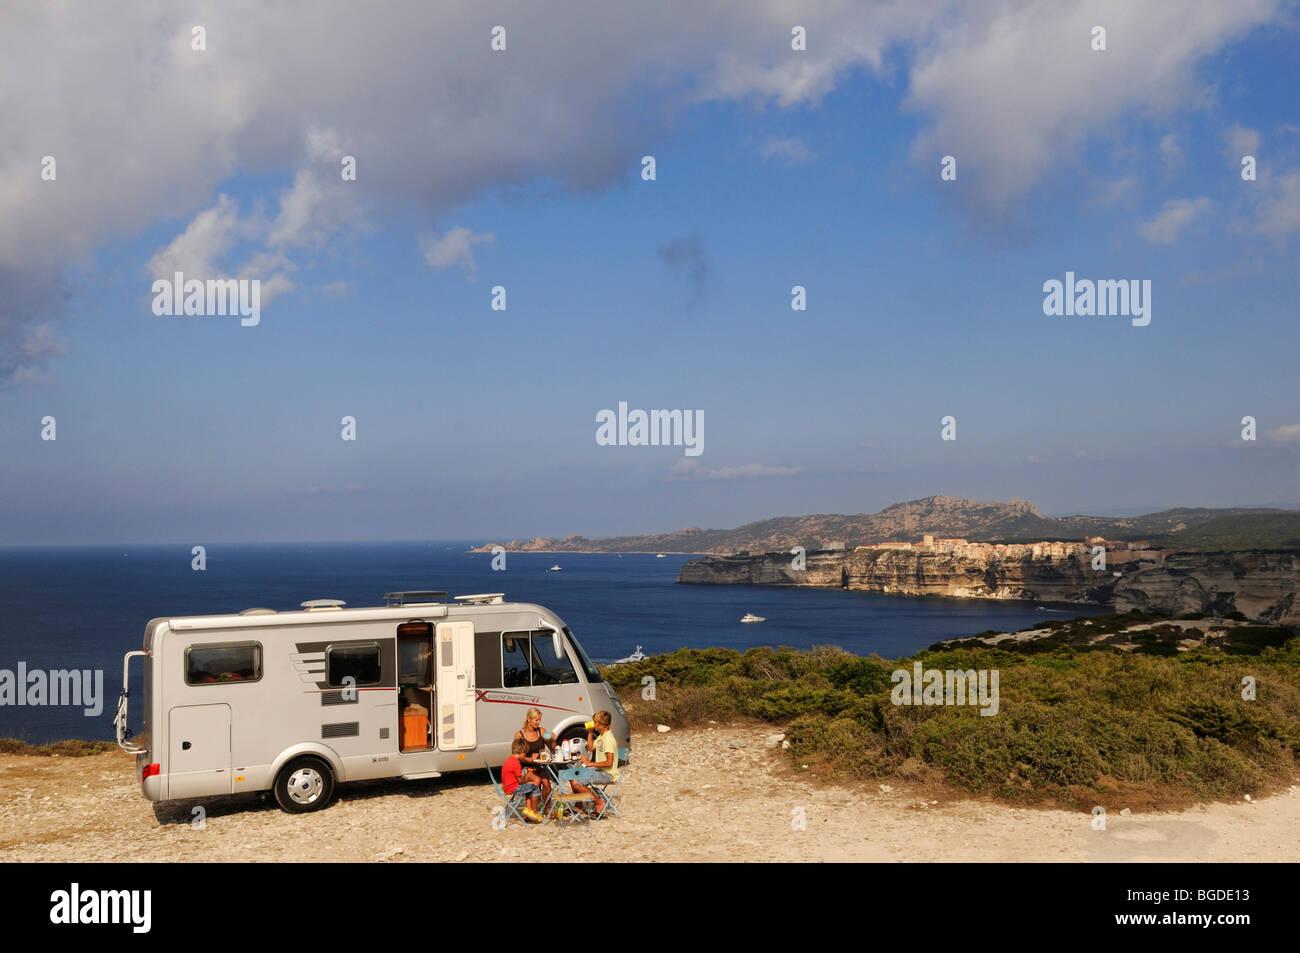 Mother and child in front of a camper, Capo Pertusato, Bonifacio, Corsica, France, Europe - Stock Image